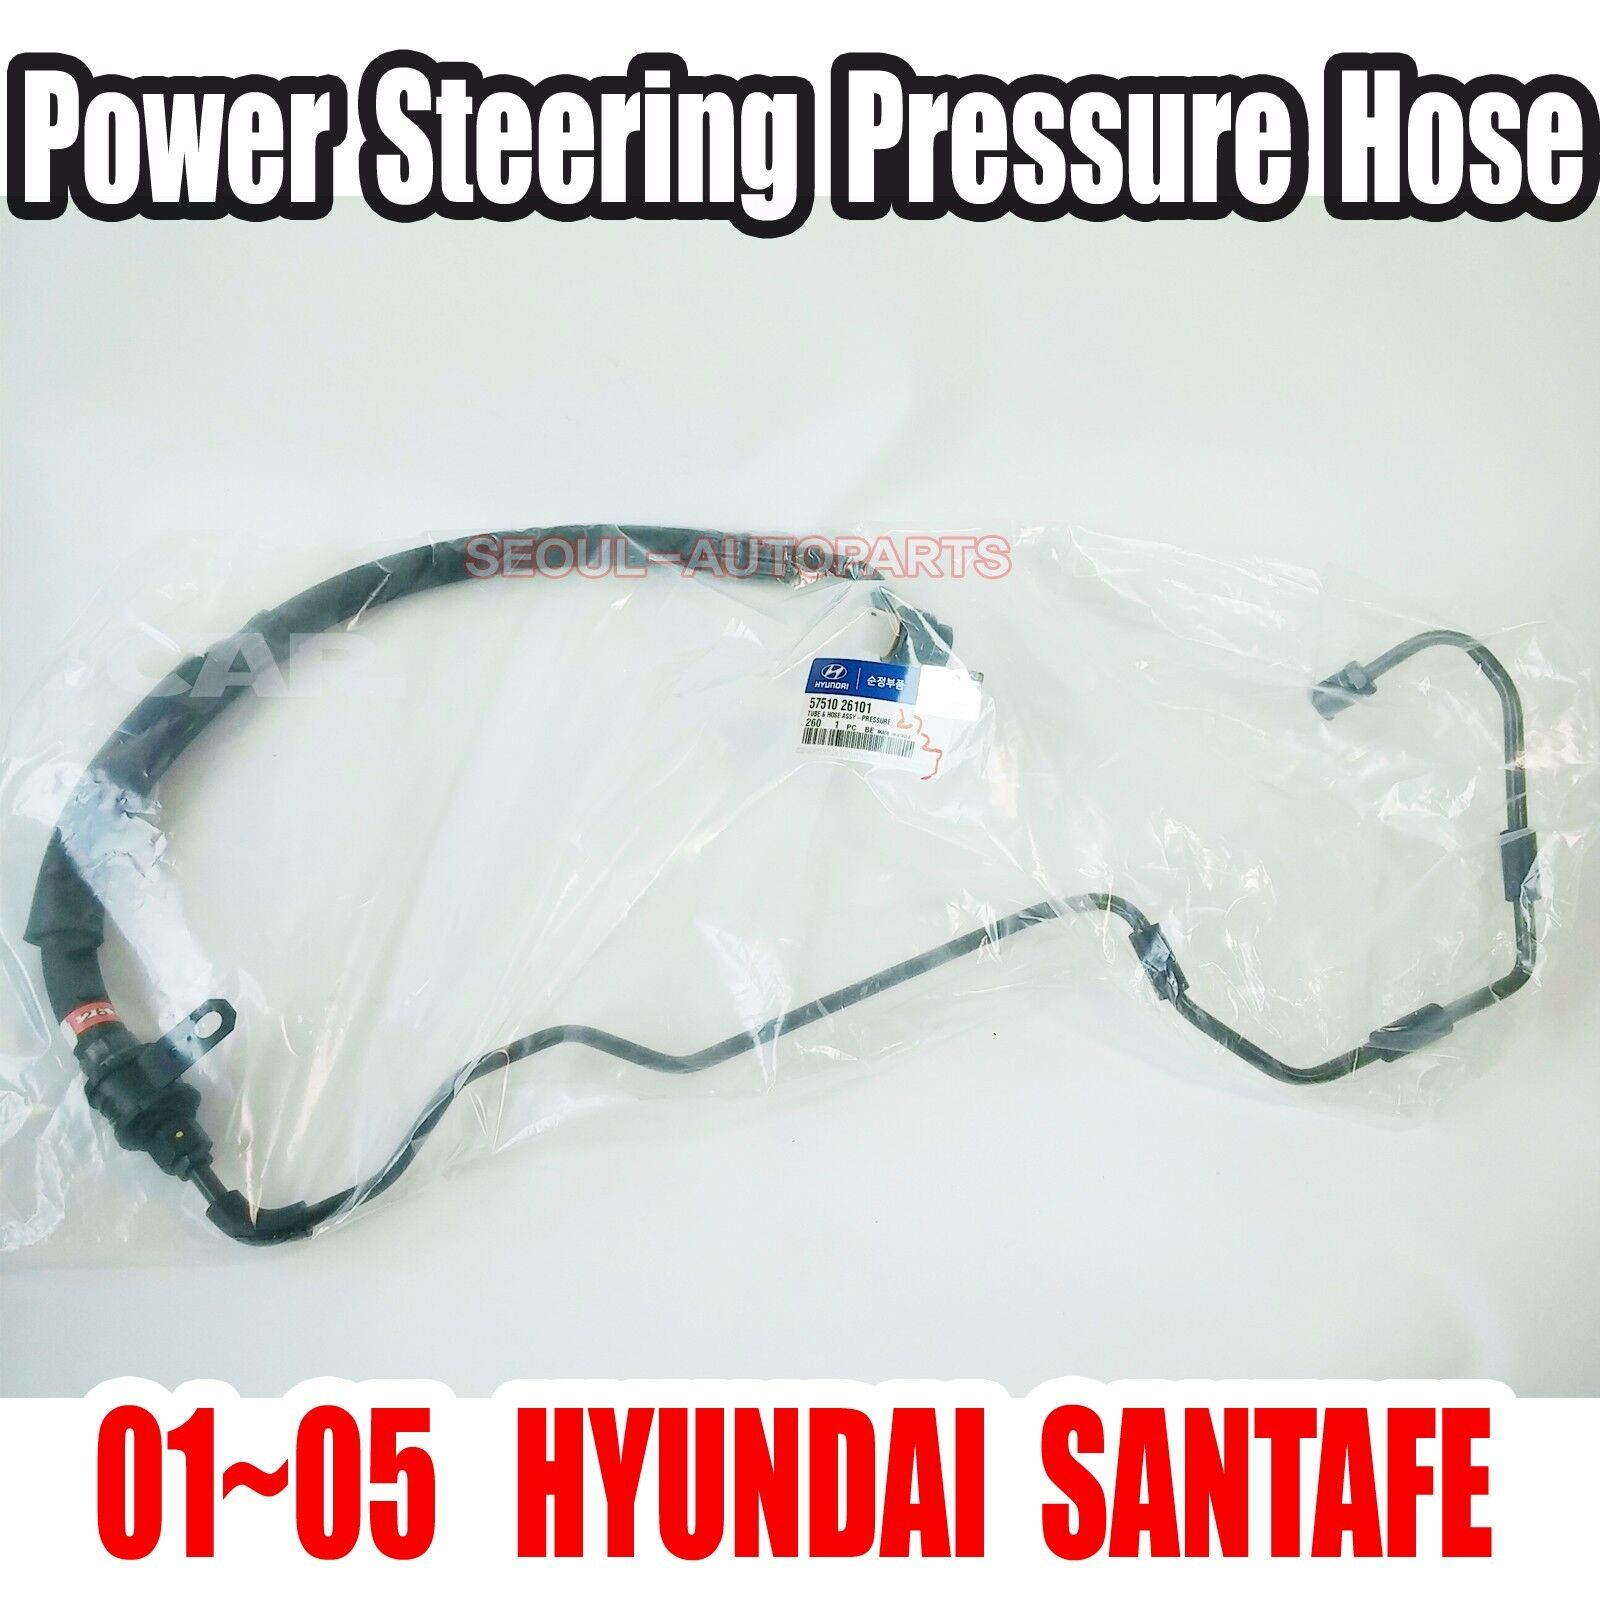 BRAND NEW POWER STEERING PRESSURE HOSE FOR 01-06 HYUNDAI SANTA FE 2.7L